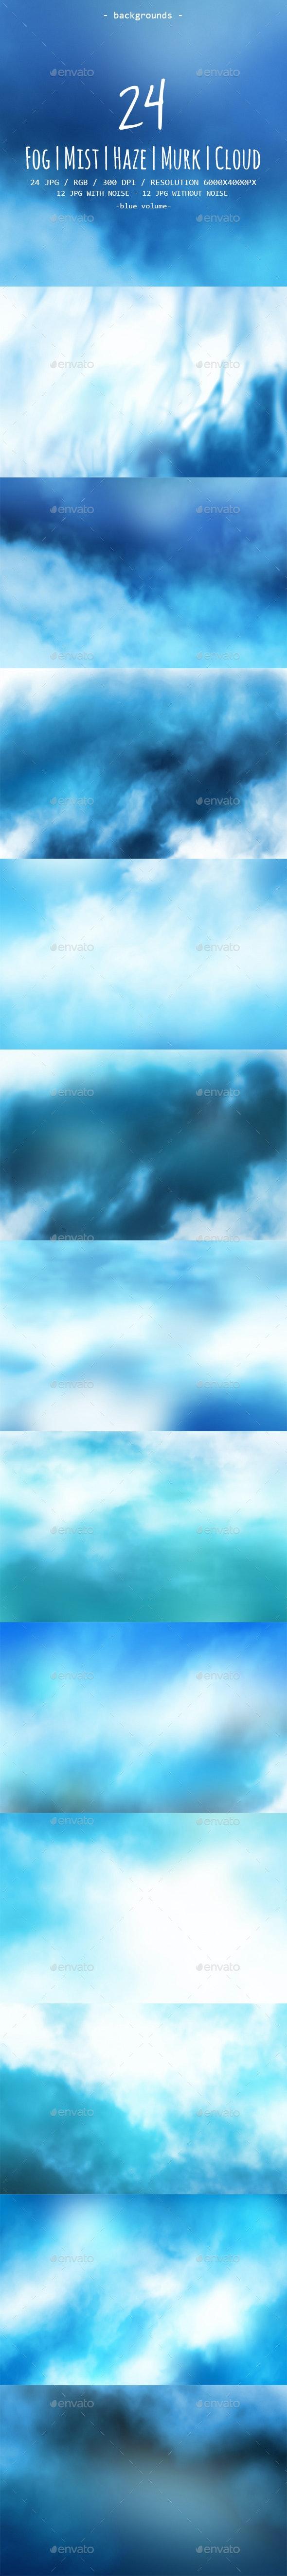 24 Fog | Mist | Haze | Murk | Cloud Backgrounds - Backgrounds Graphics